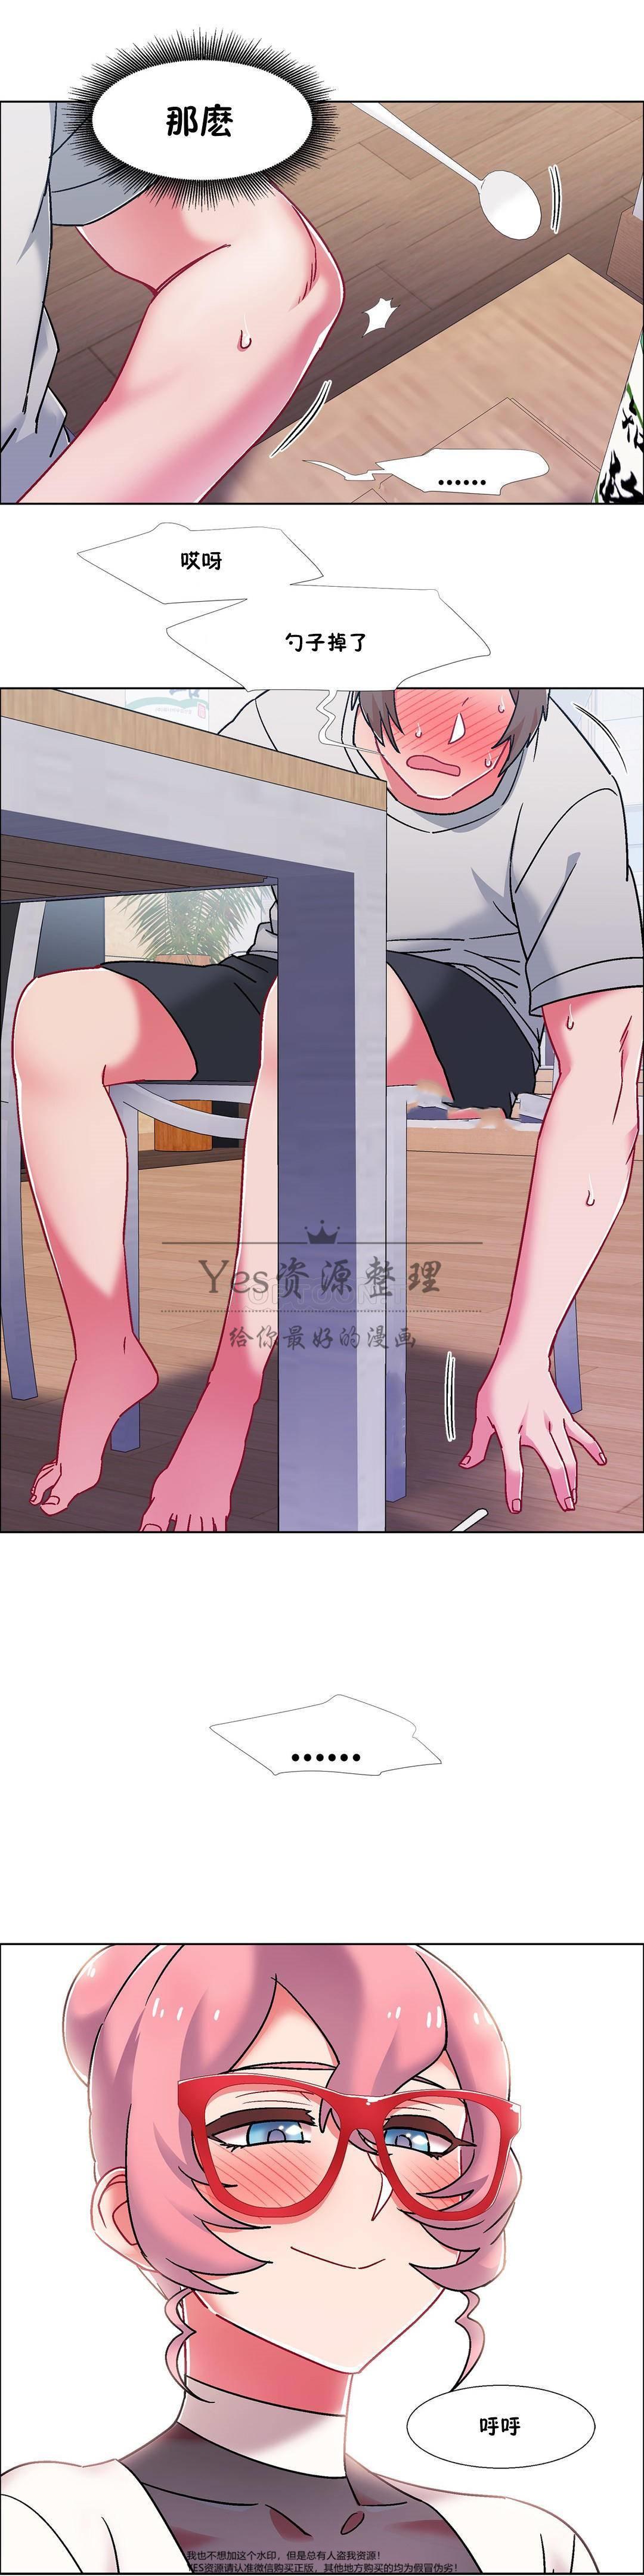 [Studio Wannabe] Rental Girls | 出租女郎 Ch. 33-58 [Chinese]  第二季 完结 559